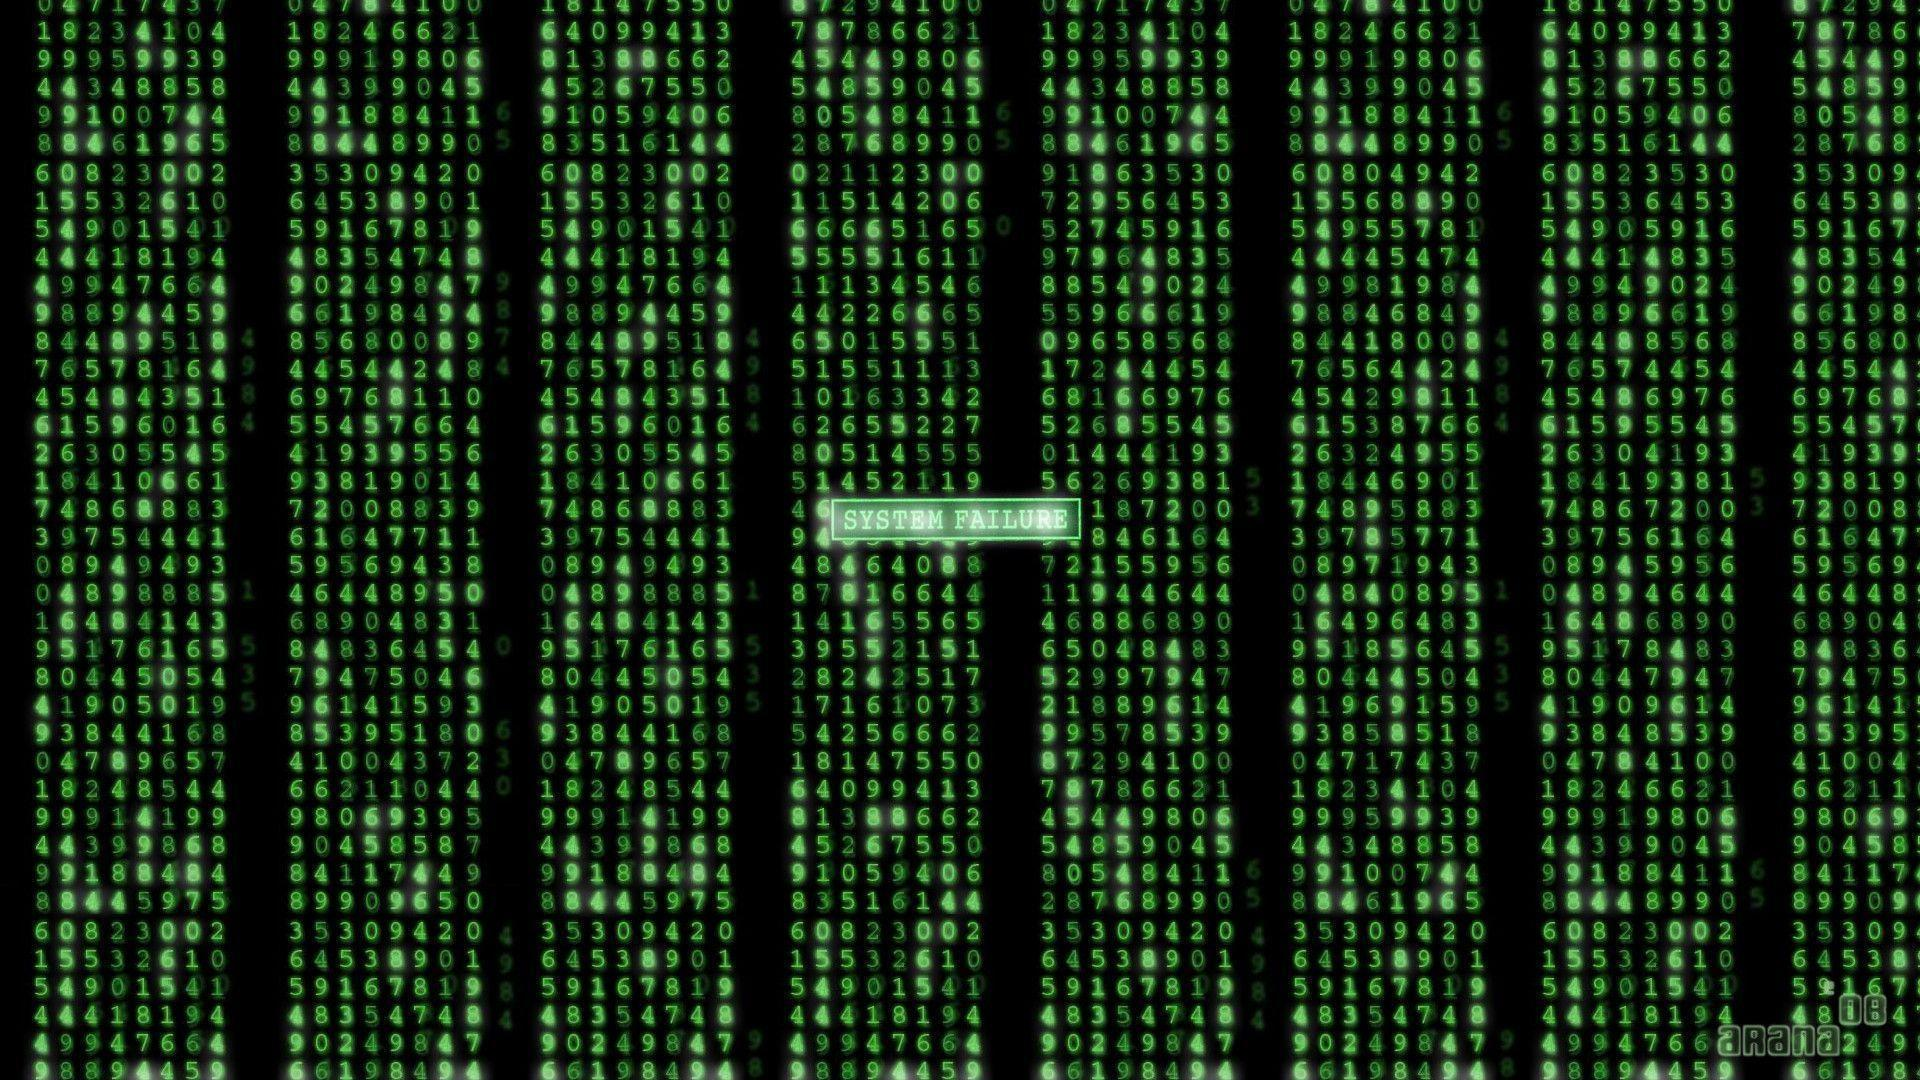 The Matrix Theme Song | Movie Theme Songs & TV Soundtracks